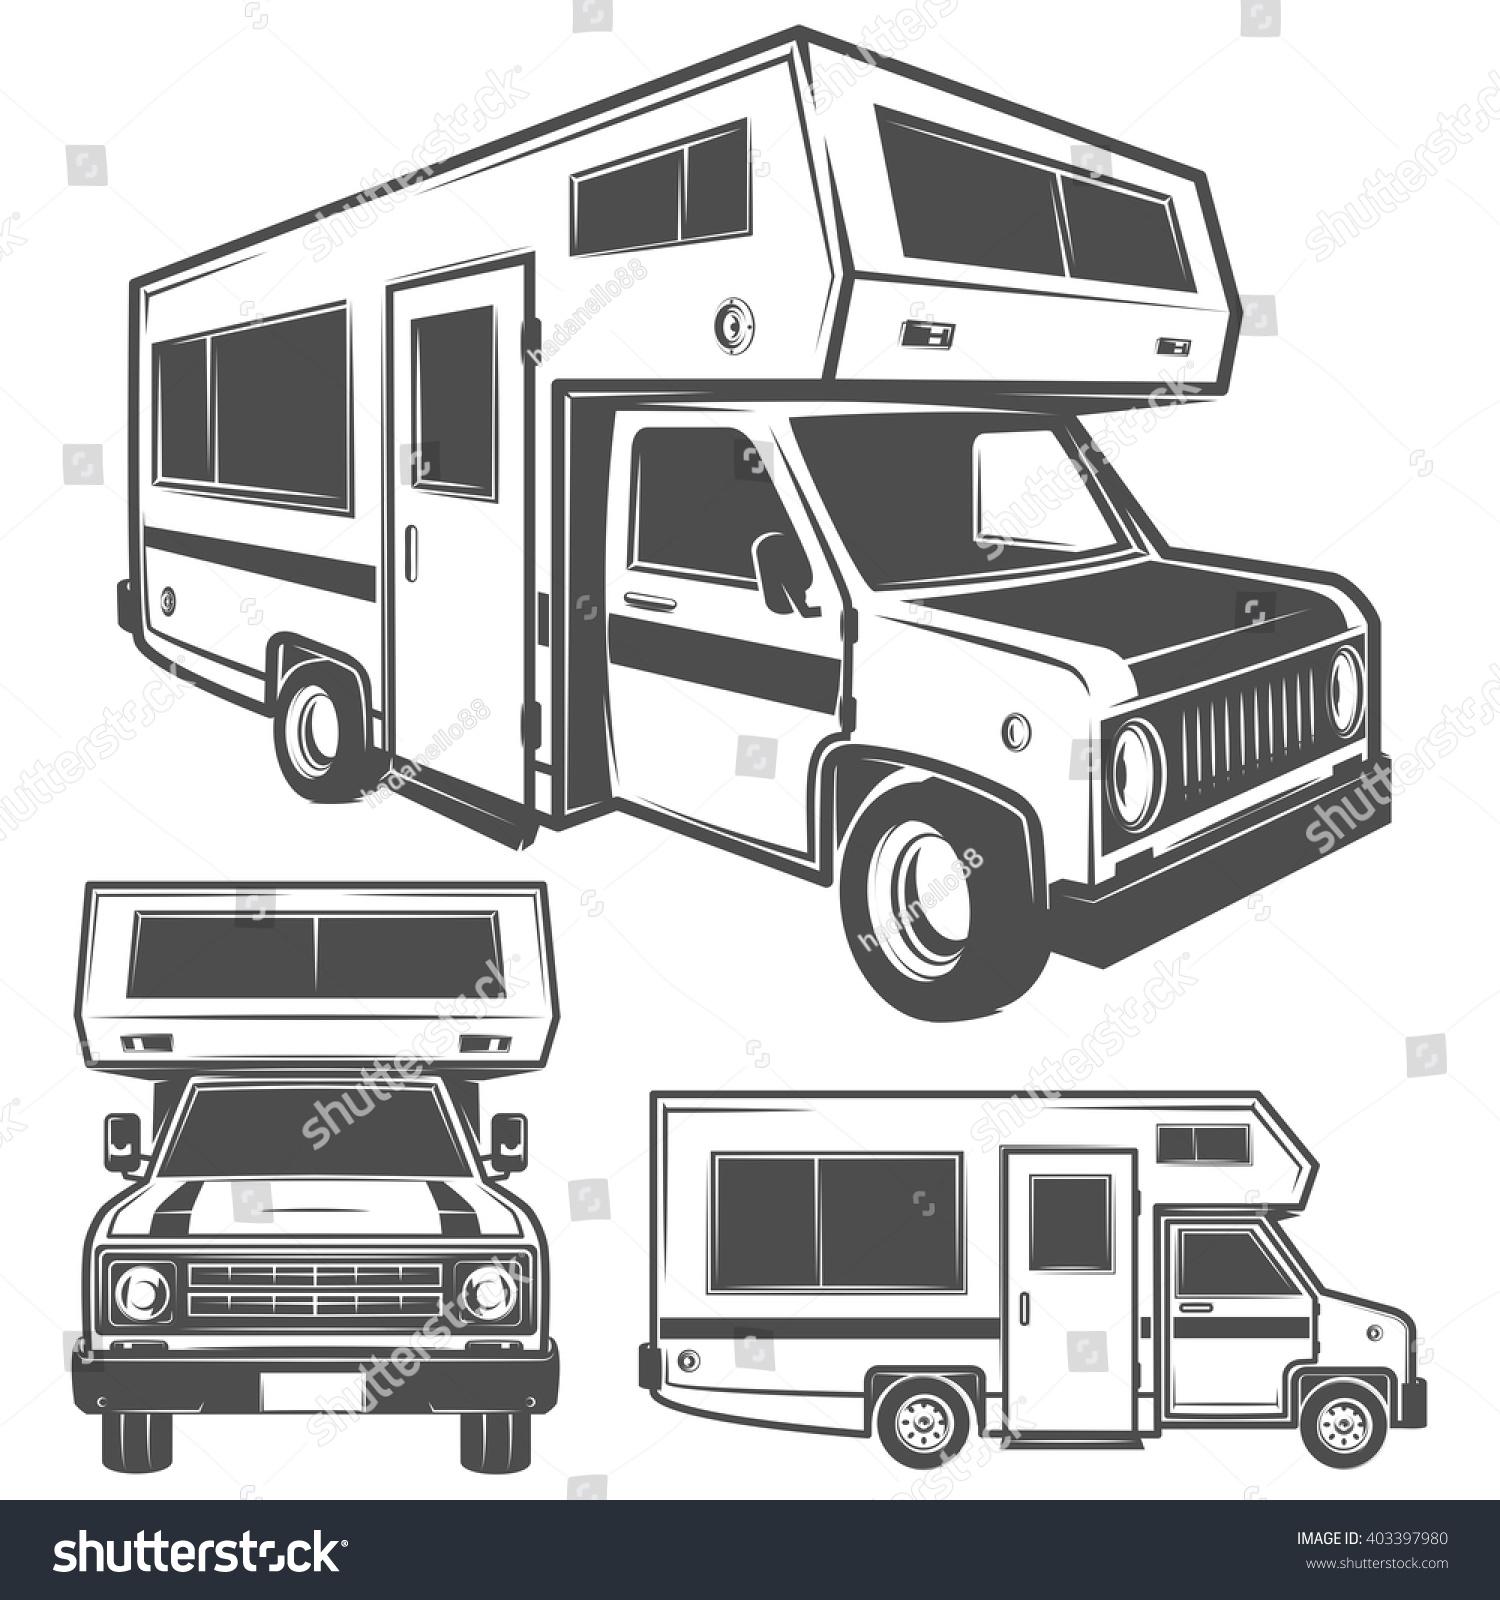 Recreational Vehicle: Rv Cars Recreational Vehicles Camper Vans Stock Vector